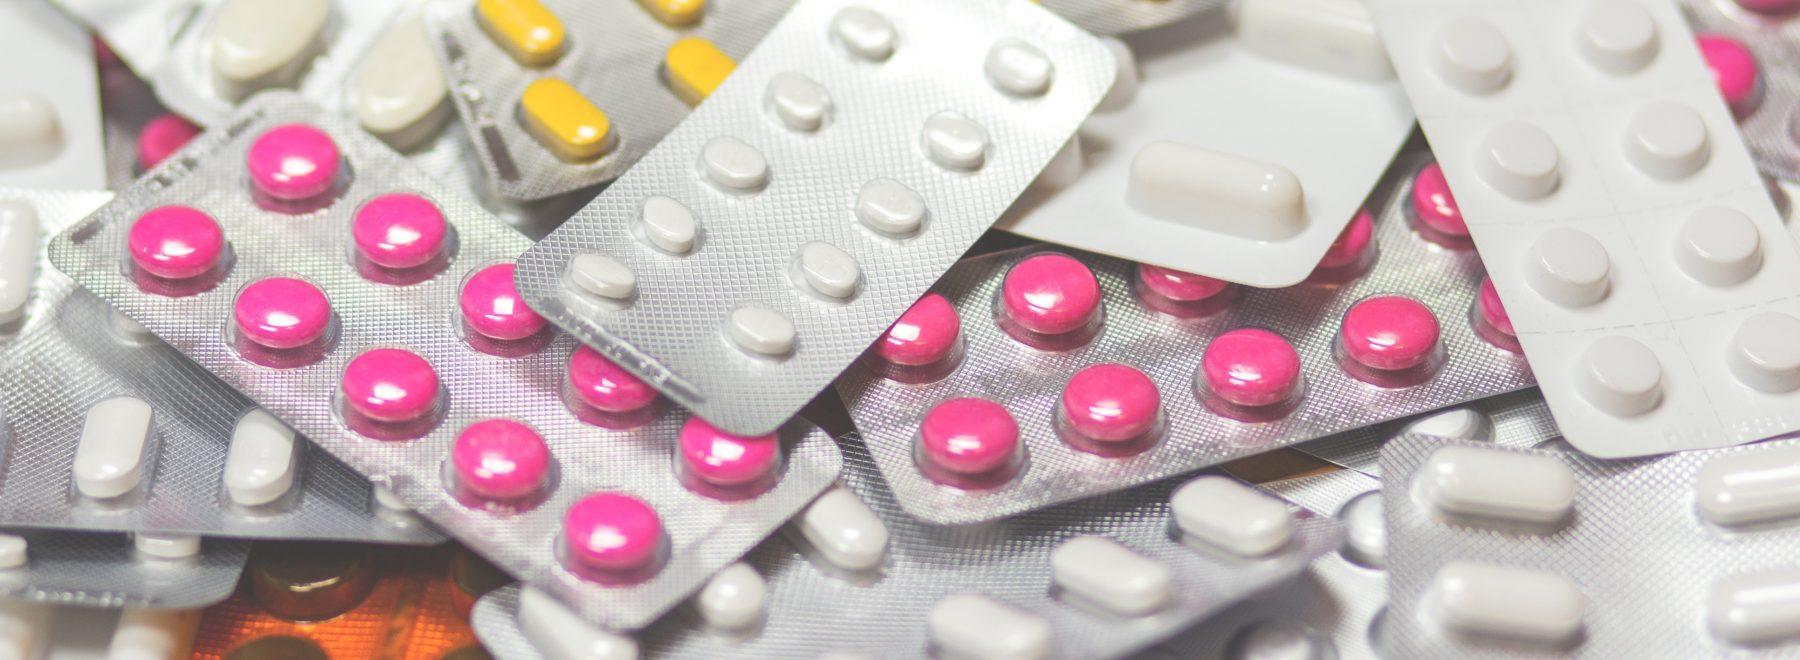 medikationsmanagement salvator apotheke mödling